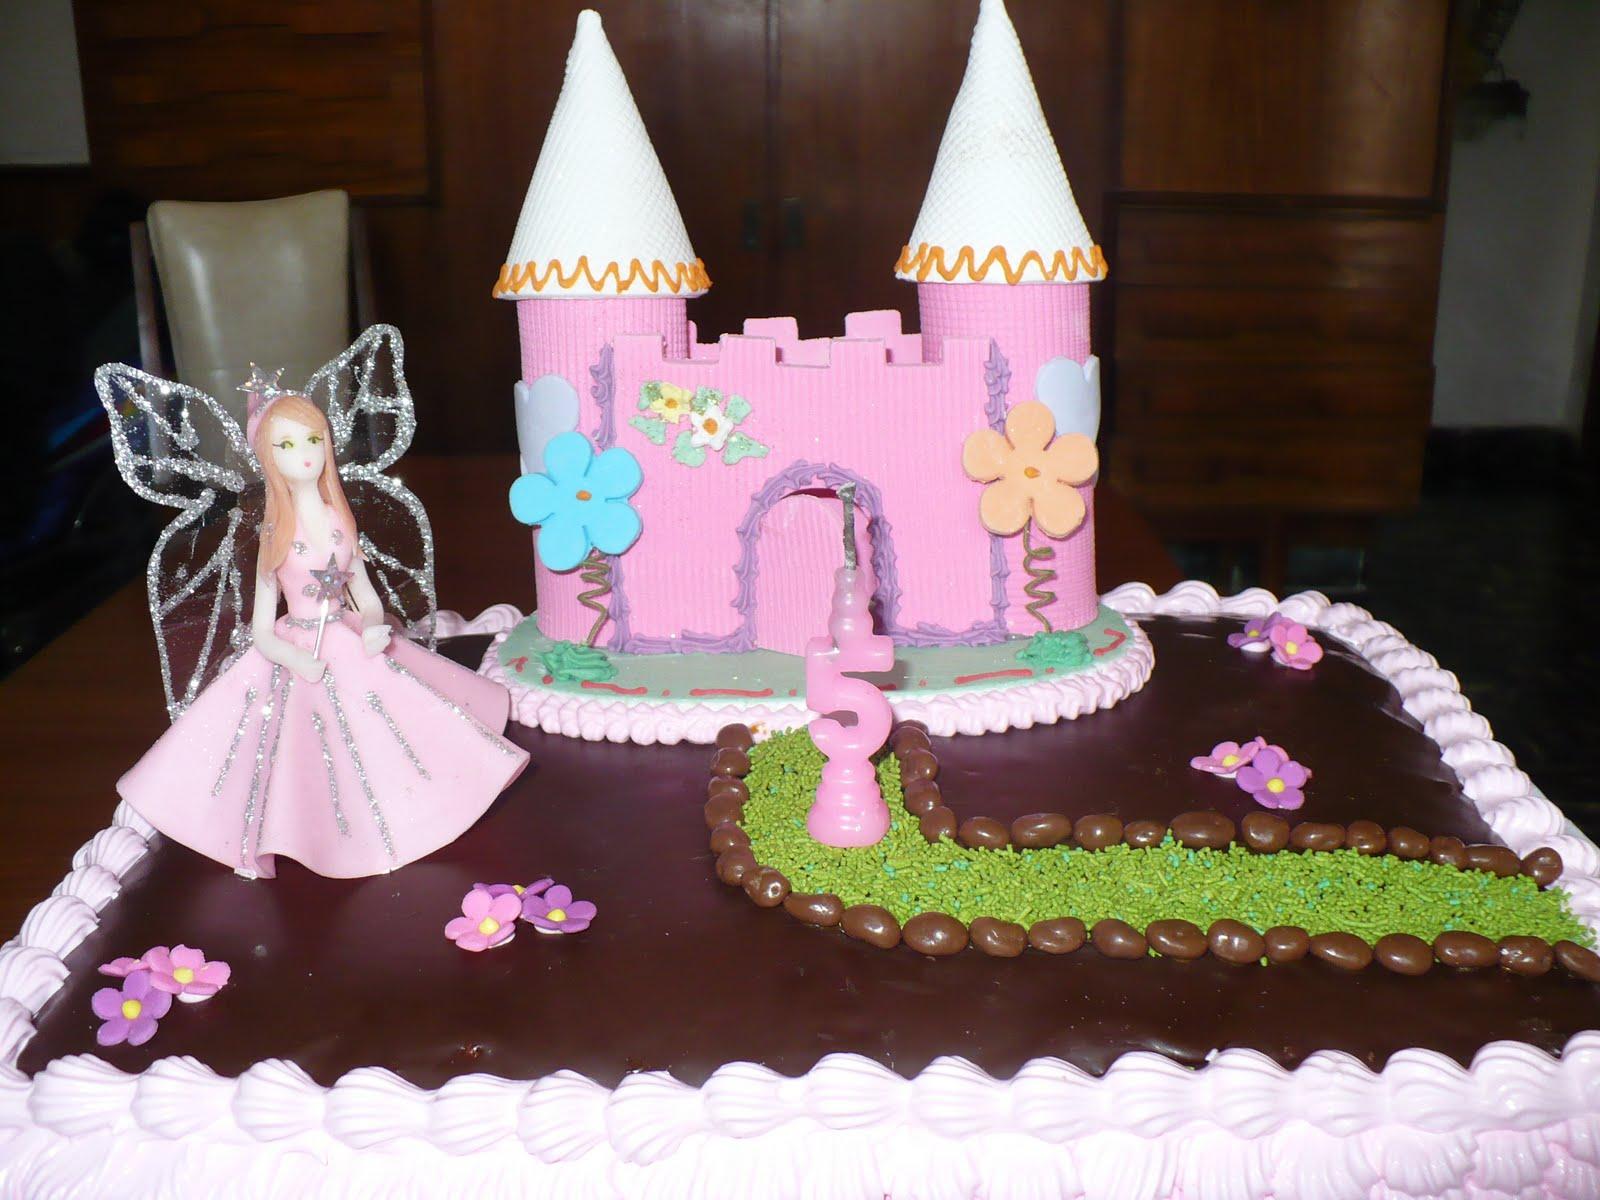 Torta de cumpleaños para niña - Imagui